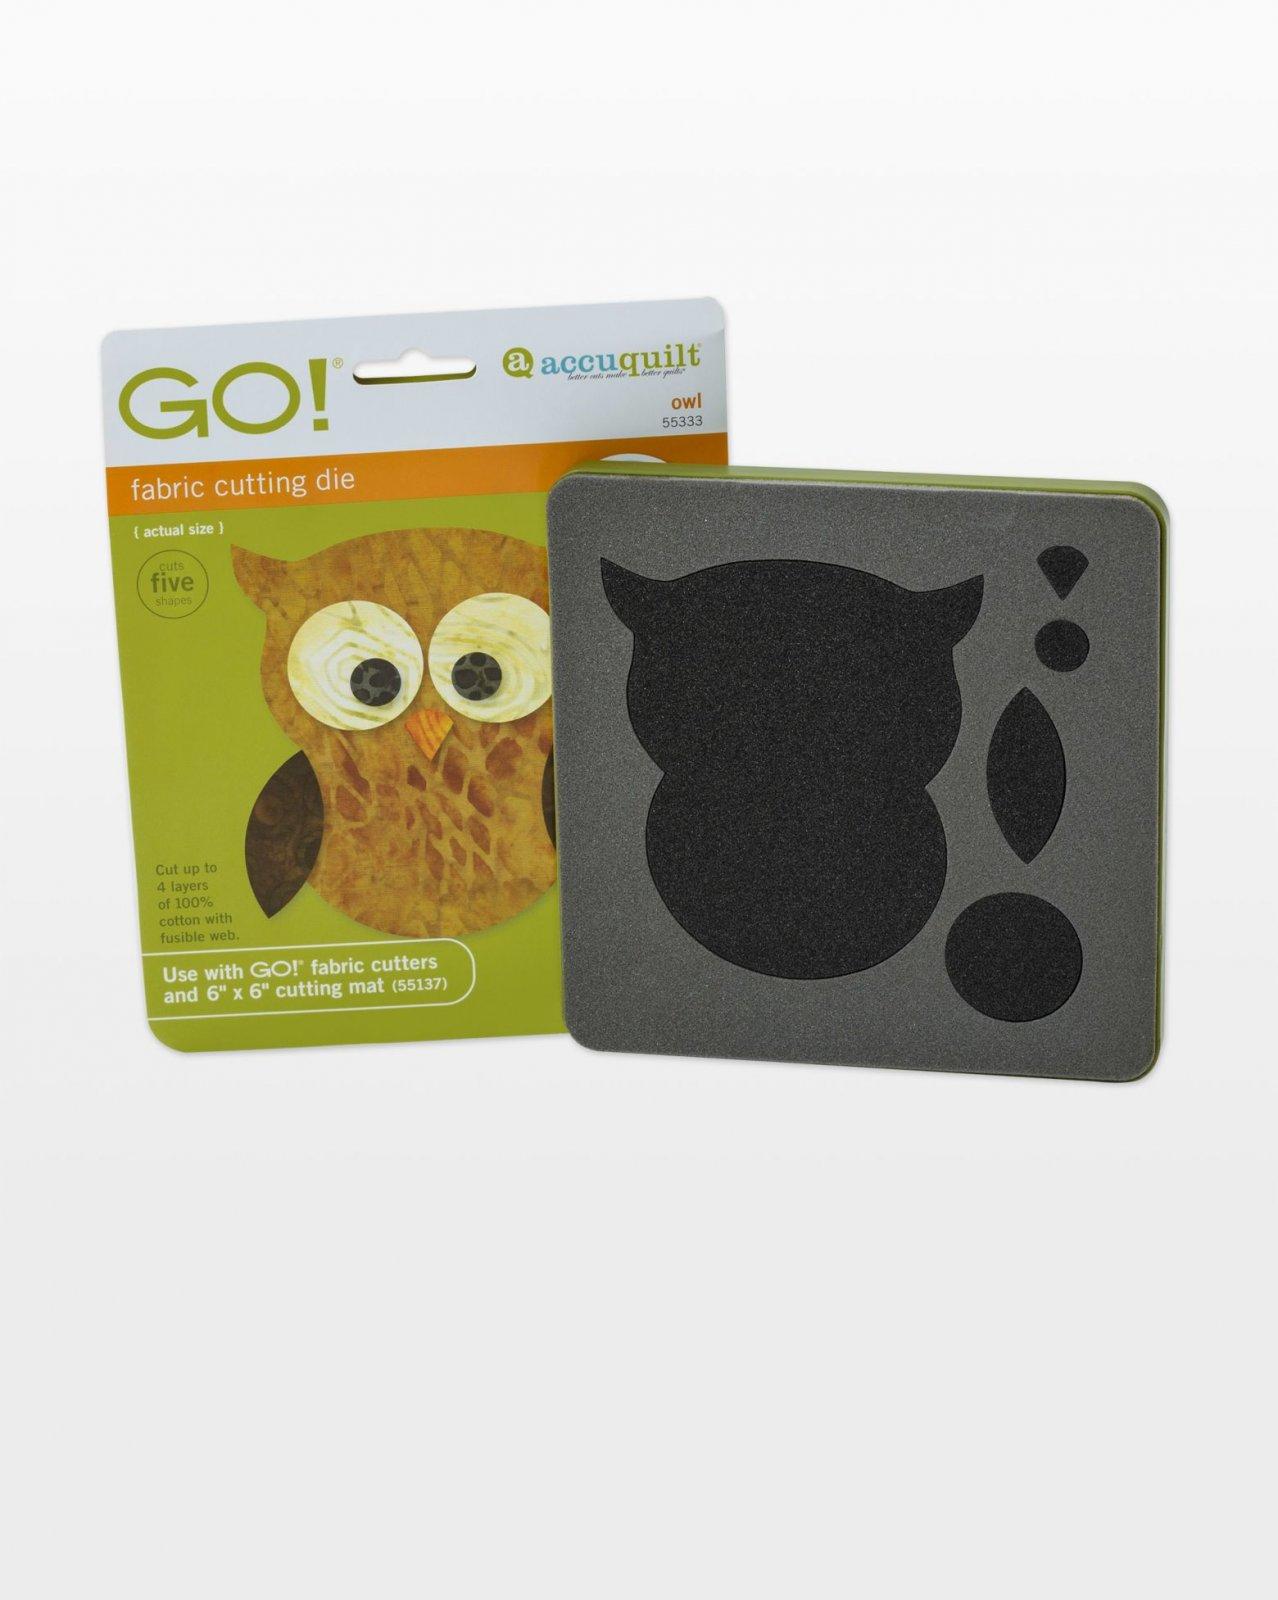 GO!- Owl Accessories Die